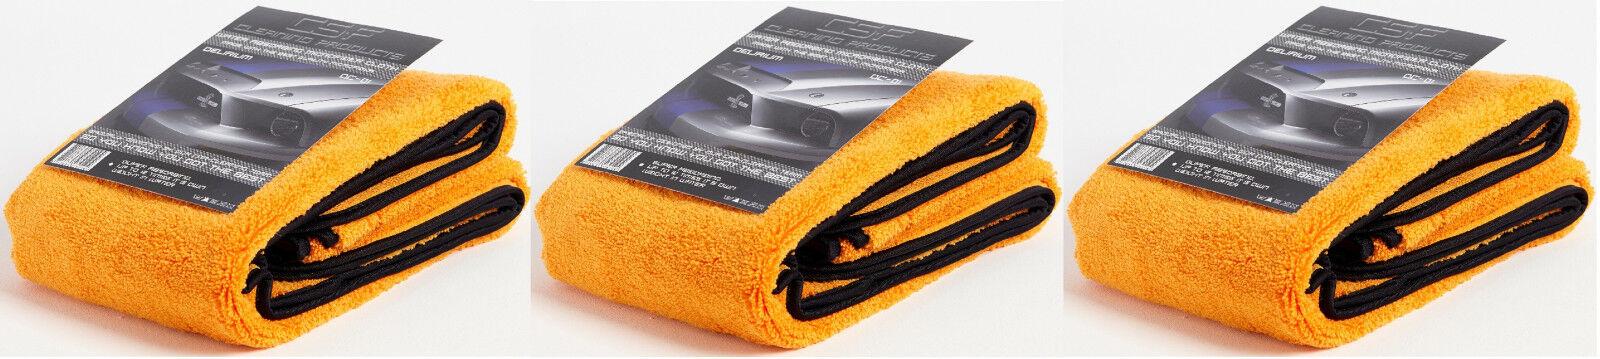 3er Pack CSF Orange Babies Drying Towel Microfaser Handtuch CSF Delirium DC01